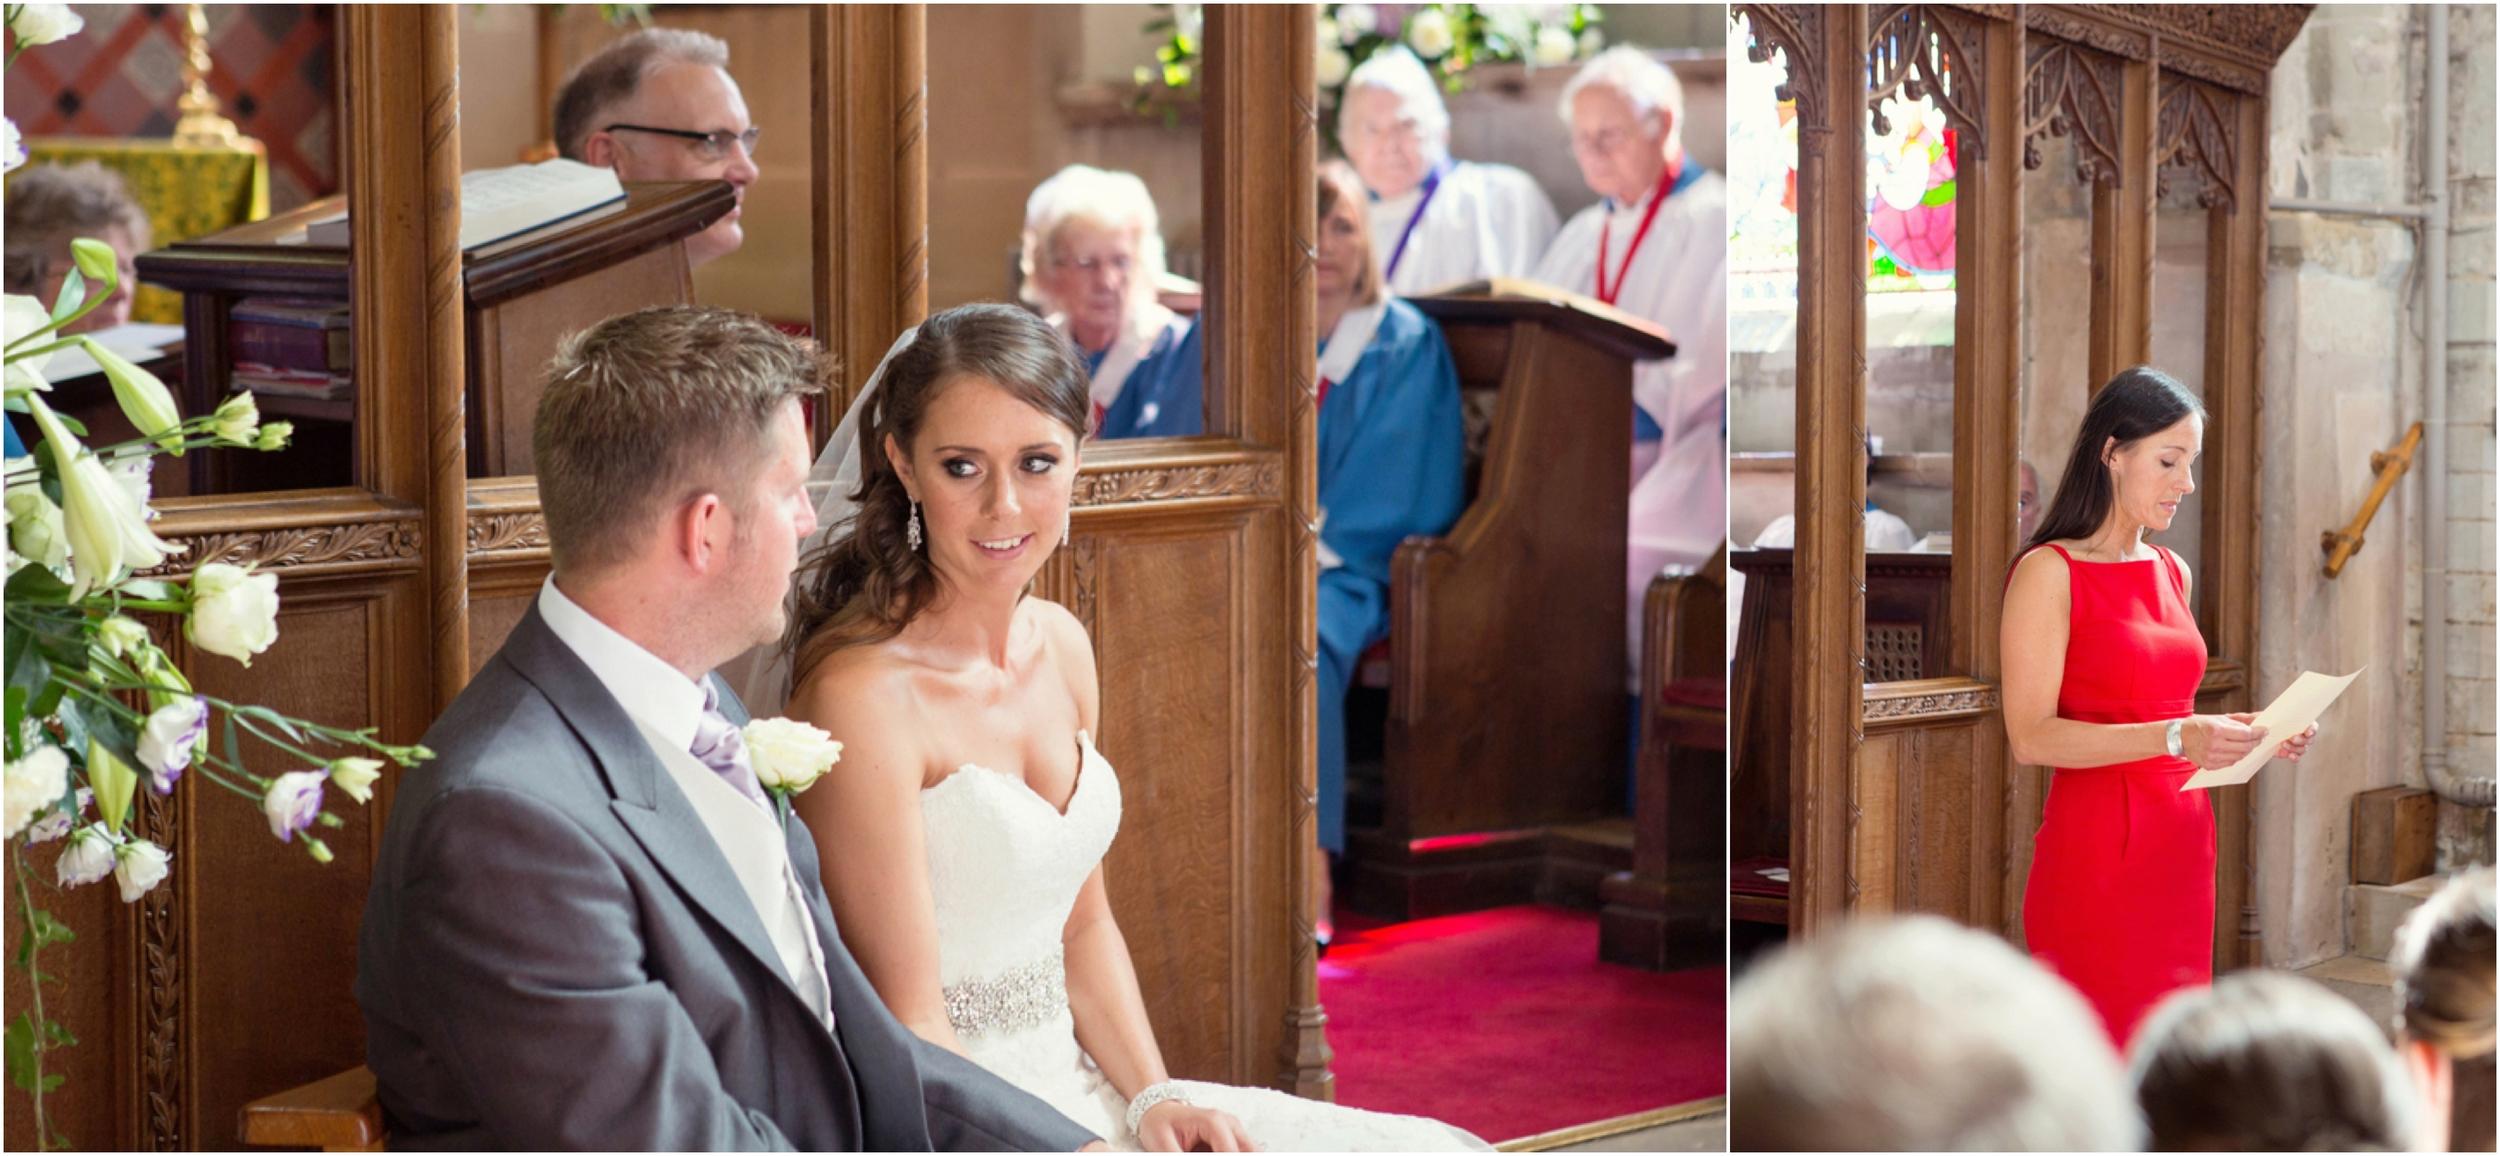 Sophie Evans Photography, Warwickshire Wedding Photography, Welcombe Hotel  (33).jpg